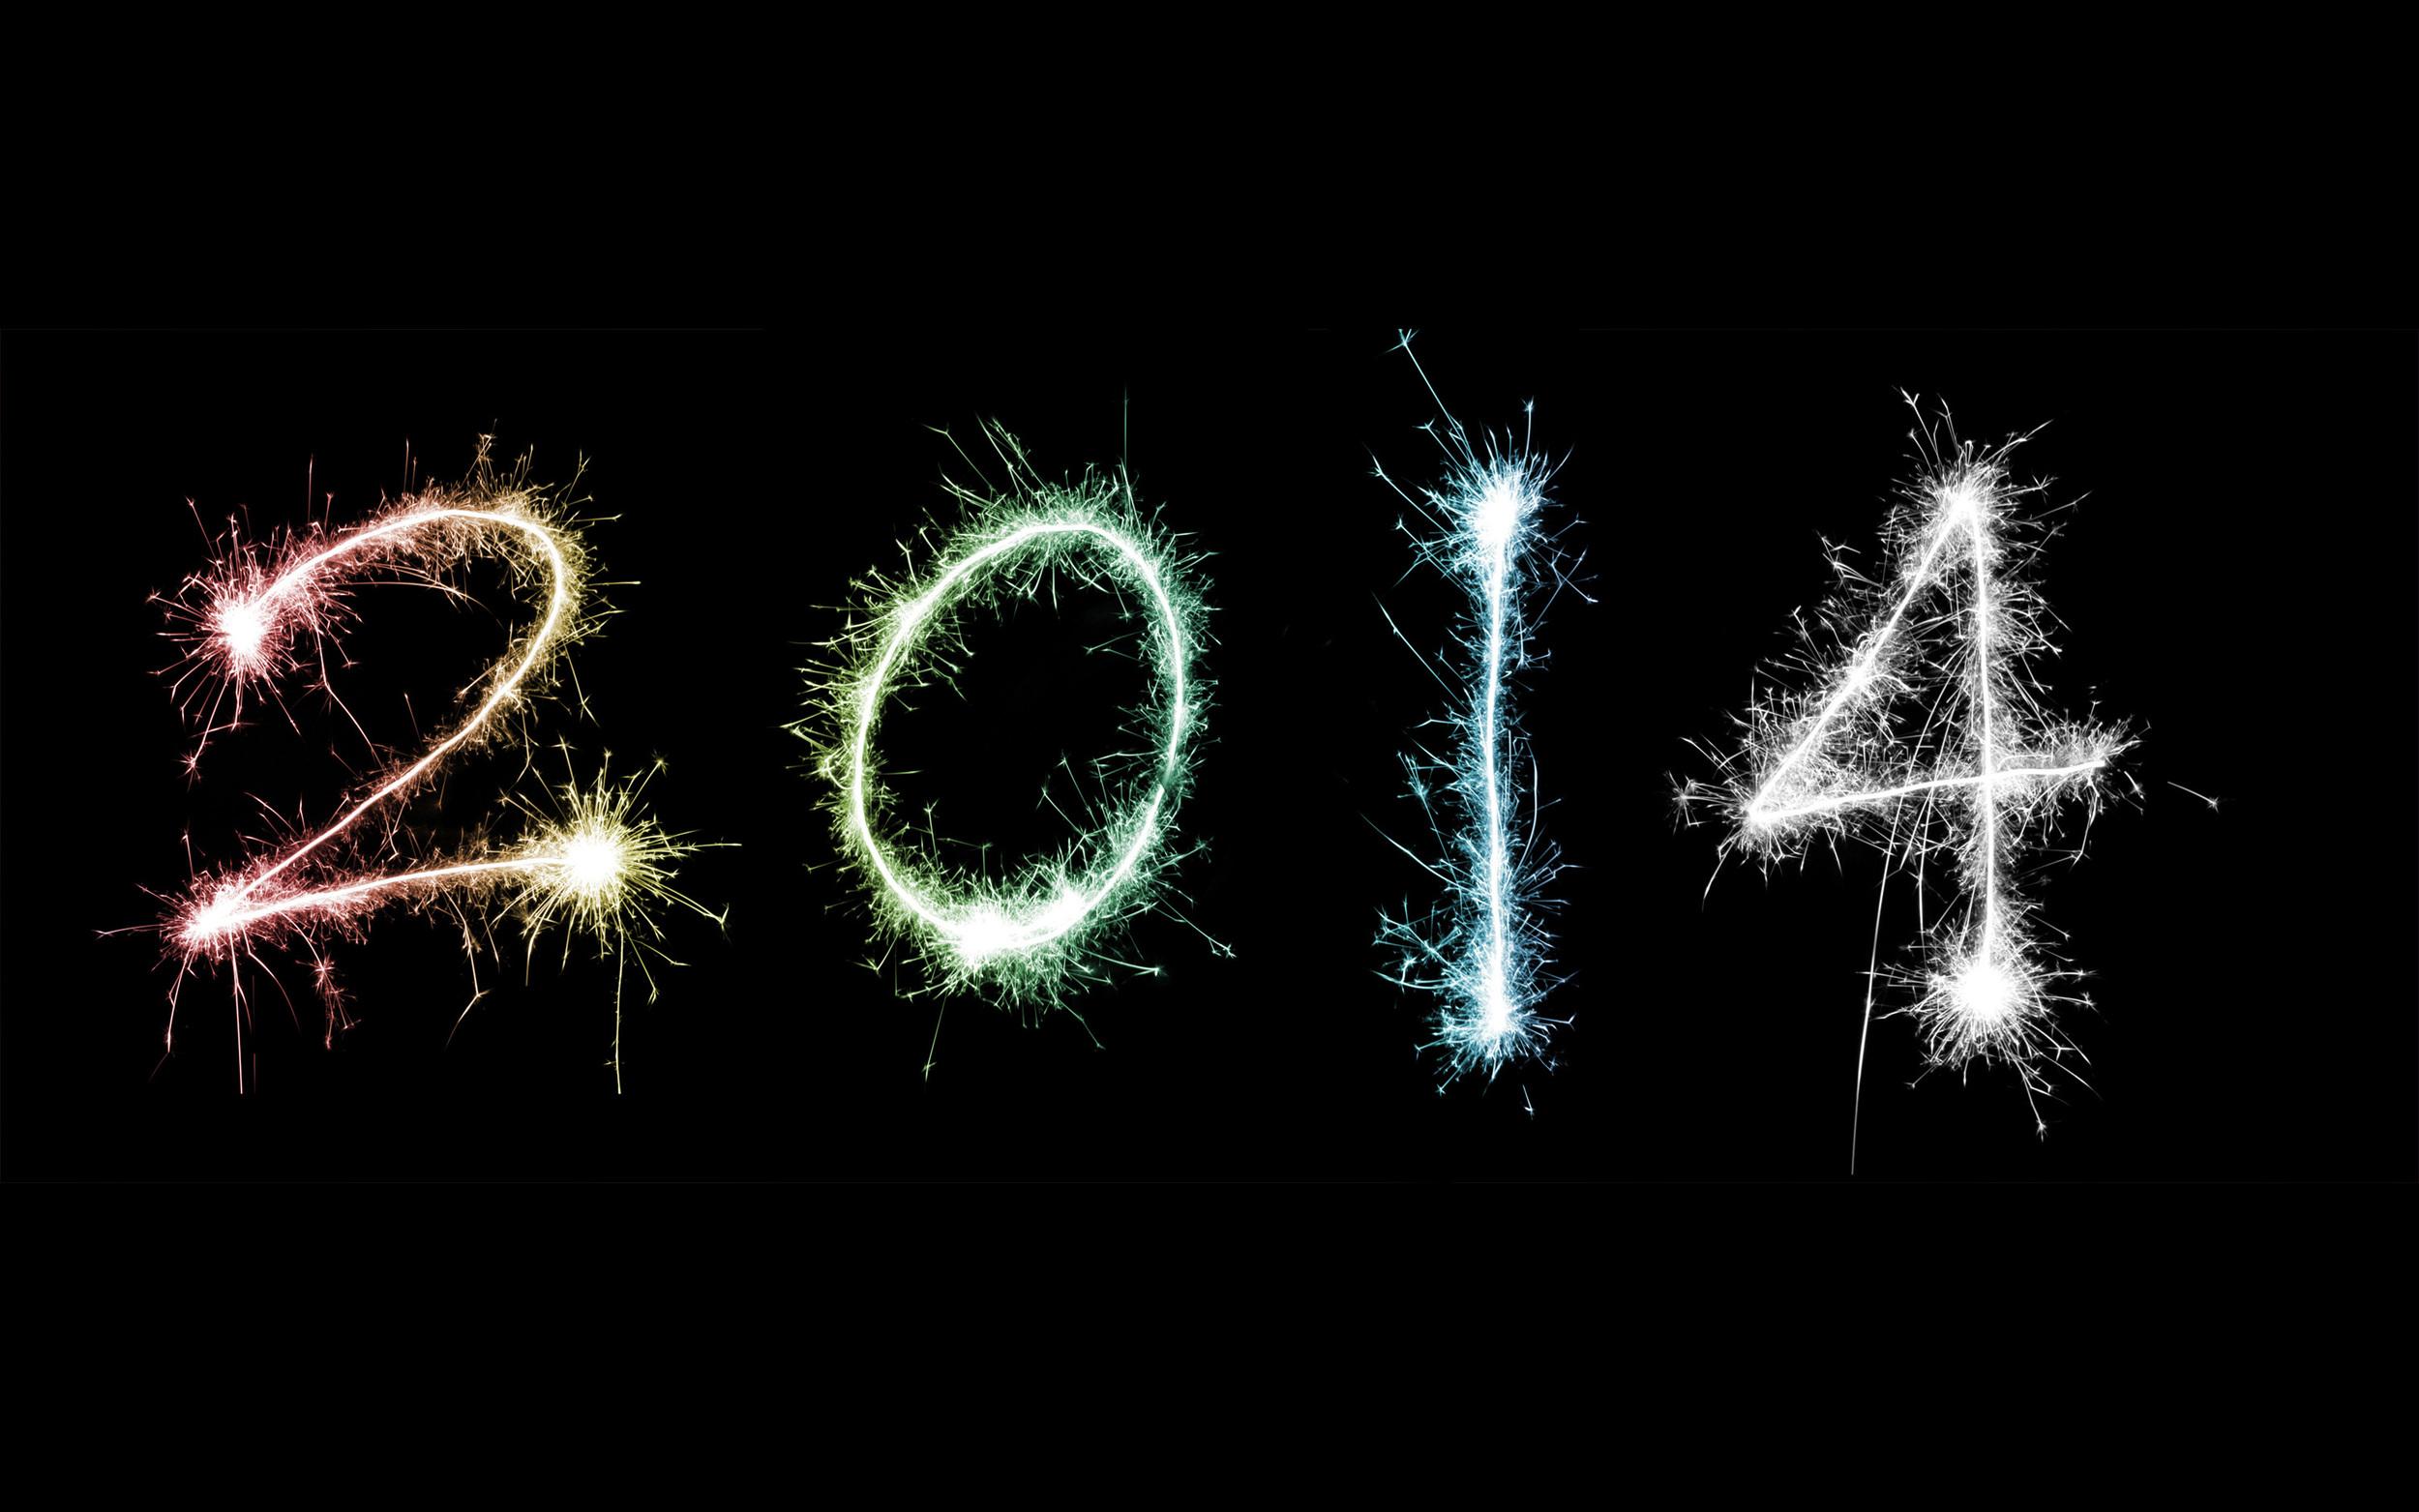 2014-New-Year-HD-Wallpaper.jpg